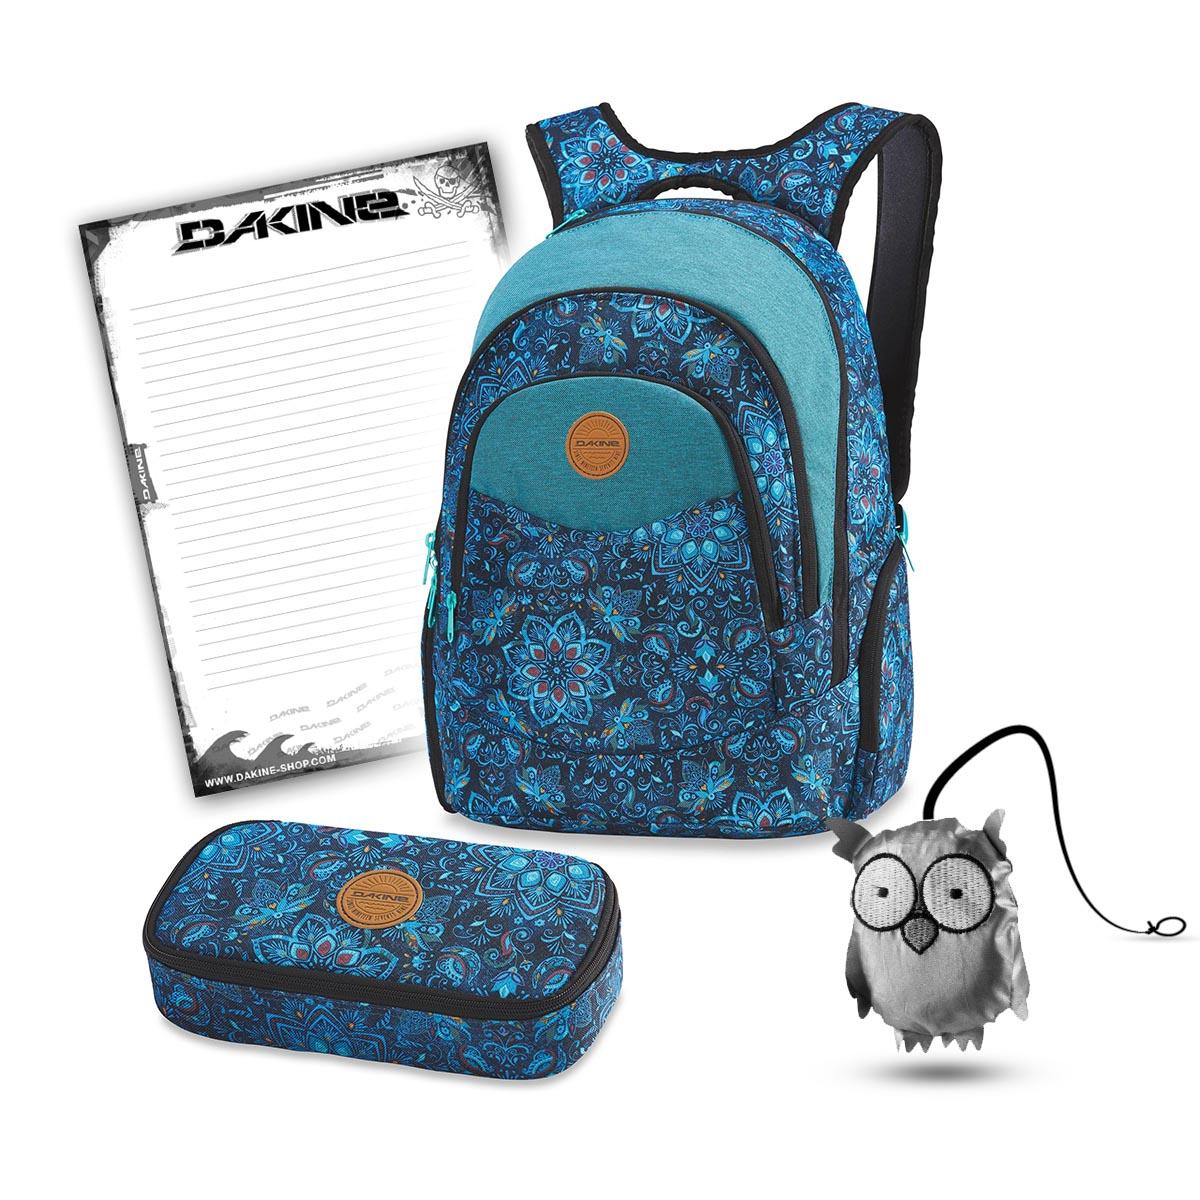 a1dfdfece153d Dakine Prom 25L + School Case XL + Emma + Notepad School Set Blue Magnolia